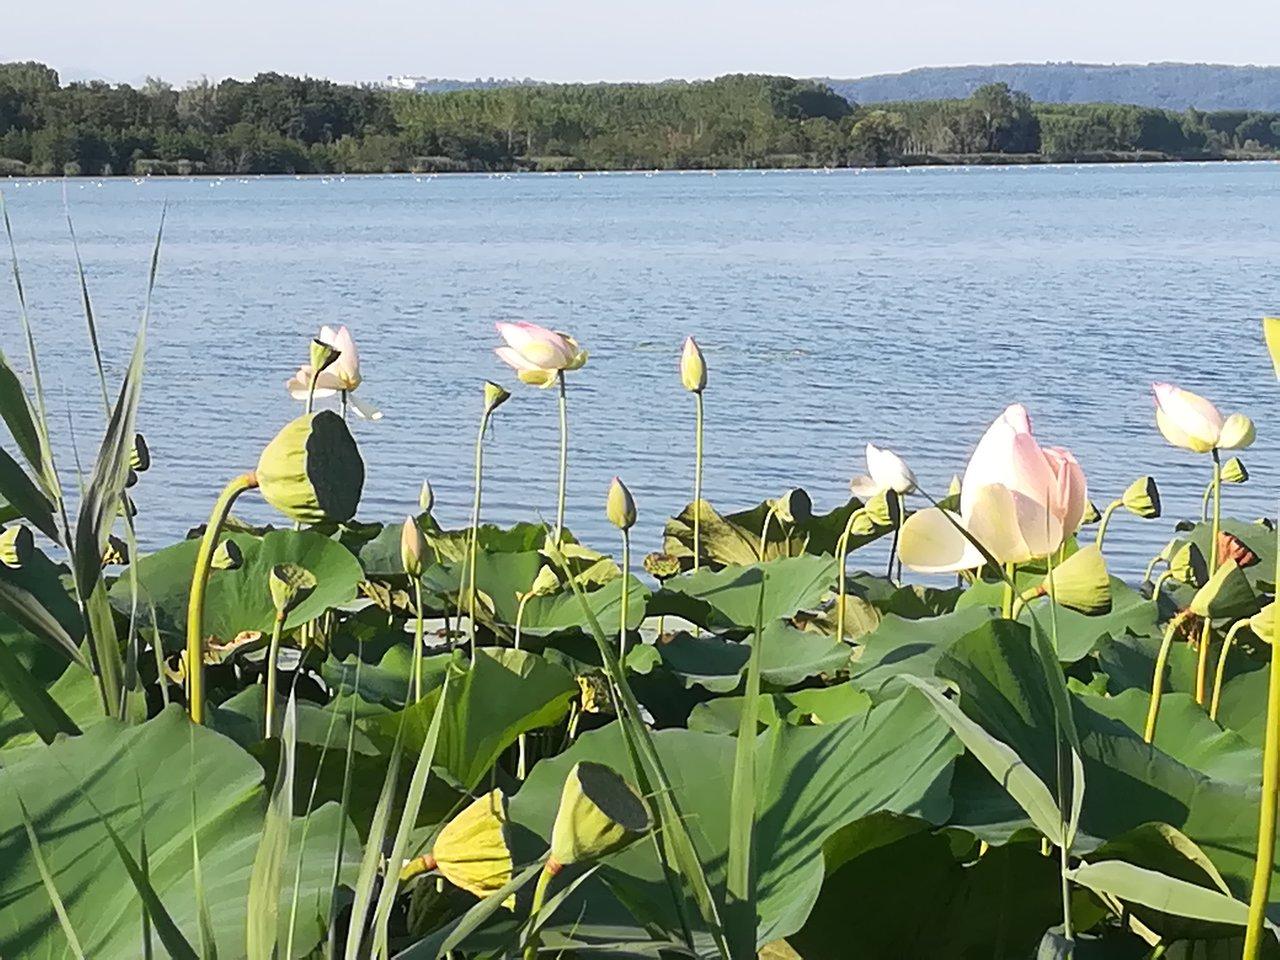 Sport e natura - Agriturismo Parco del Grep - Monferrato, Piemonte - Parco Avventura Anthares World